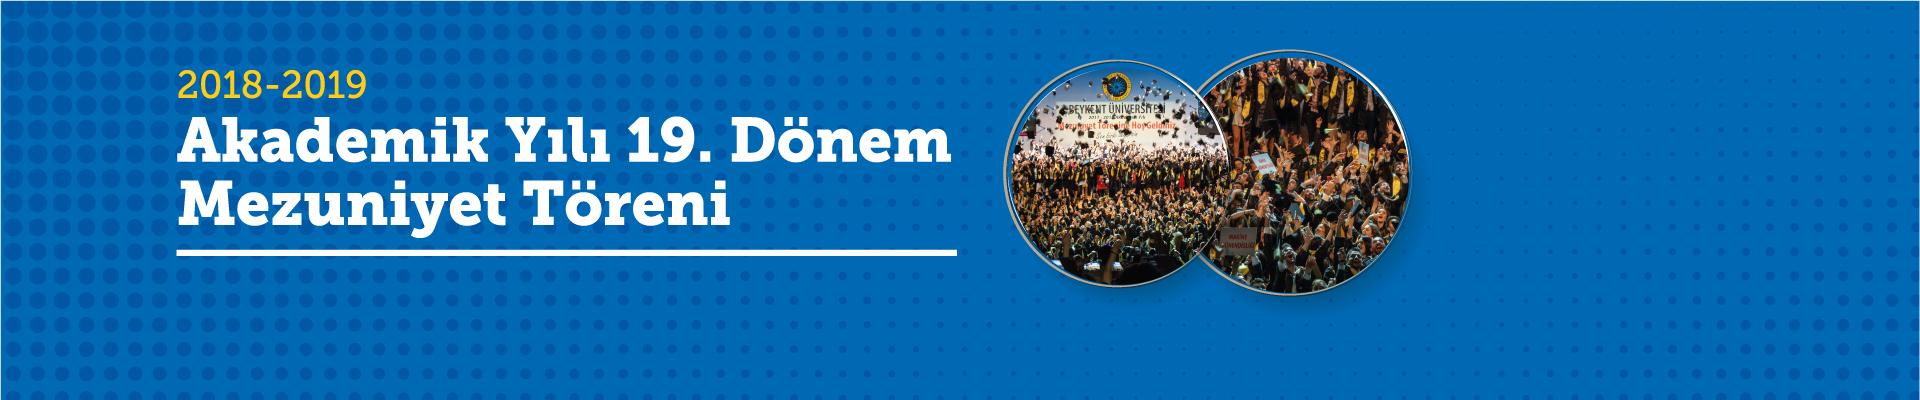 2018-2019-Mezuniyet-Toreni-1920x400